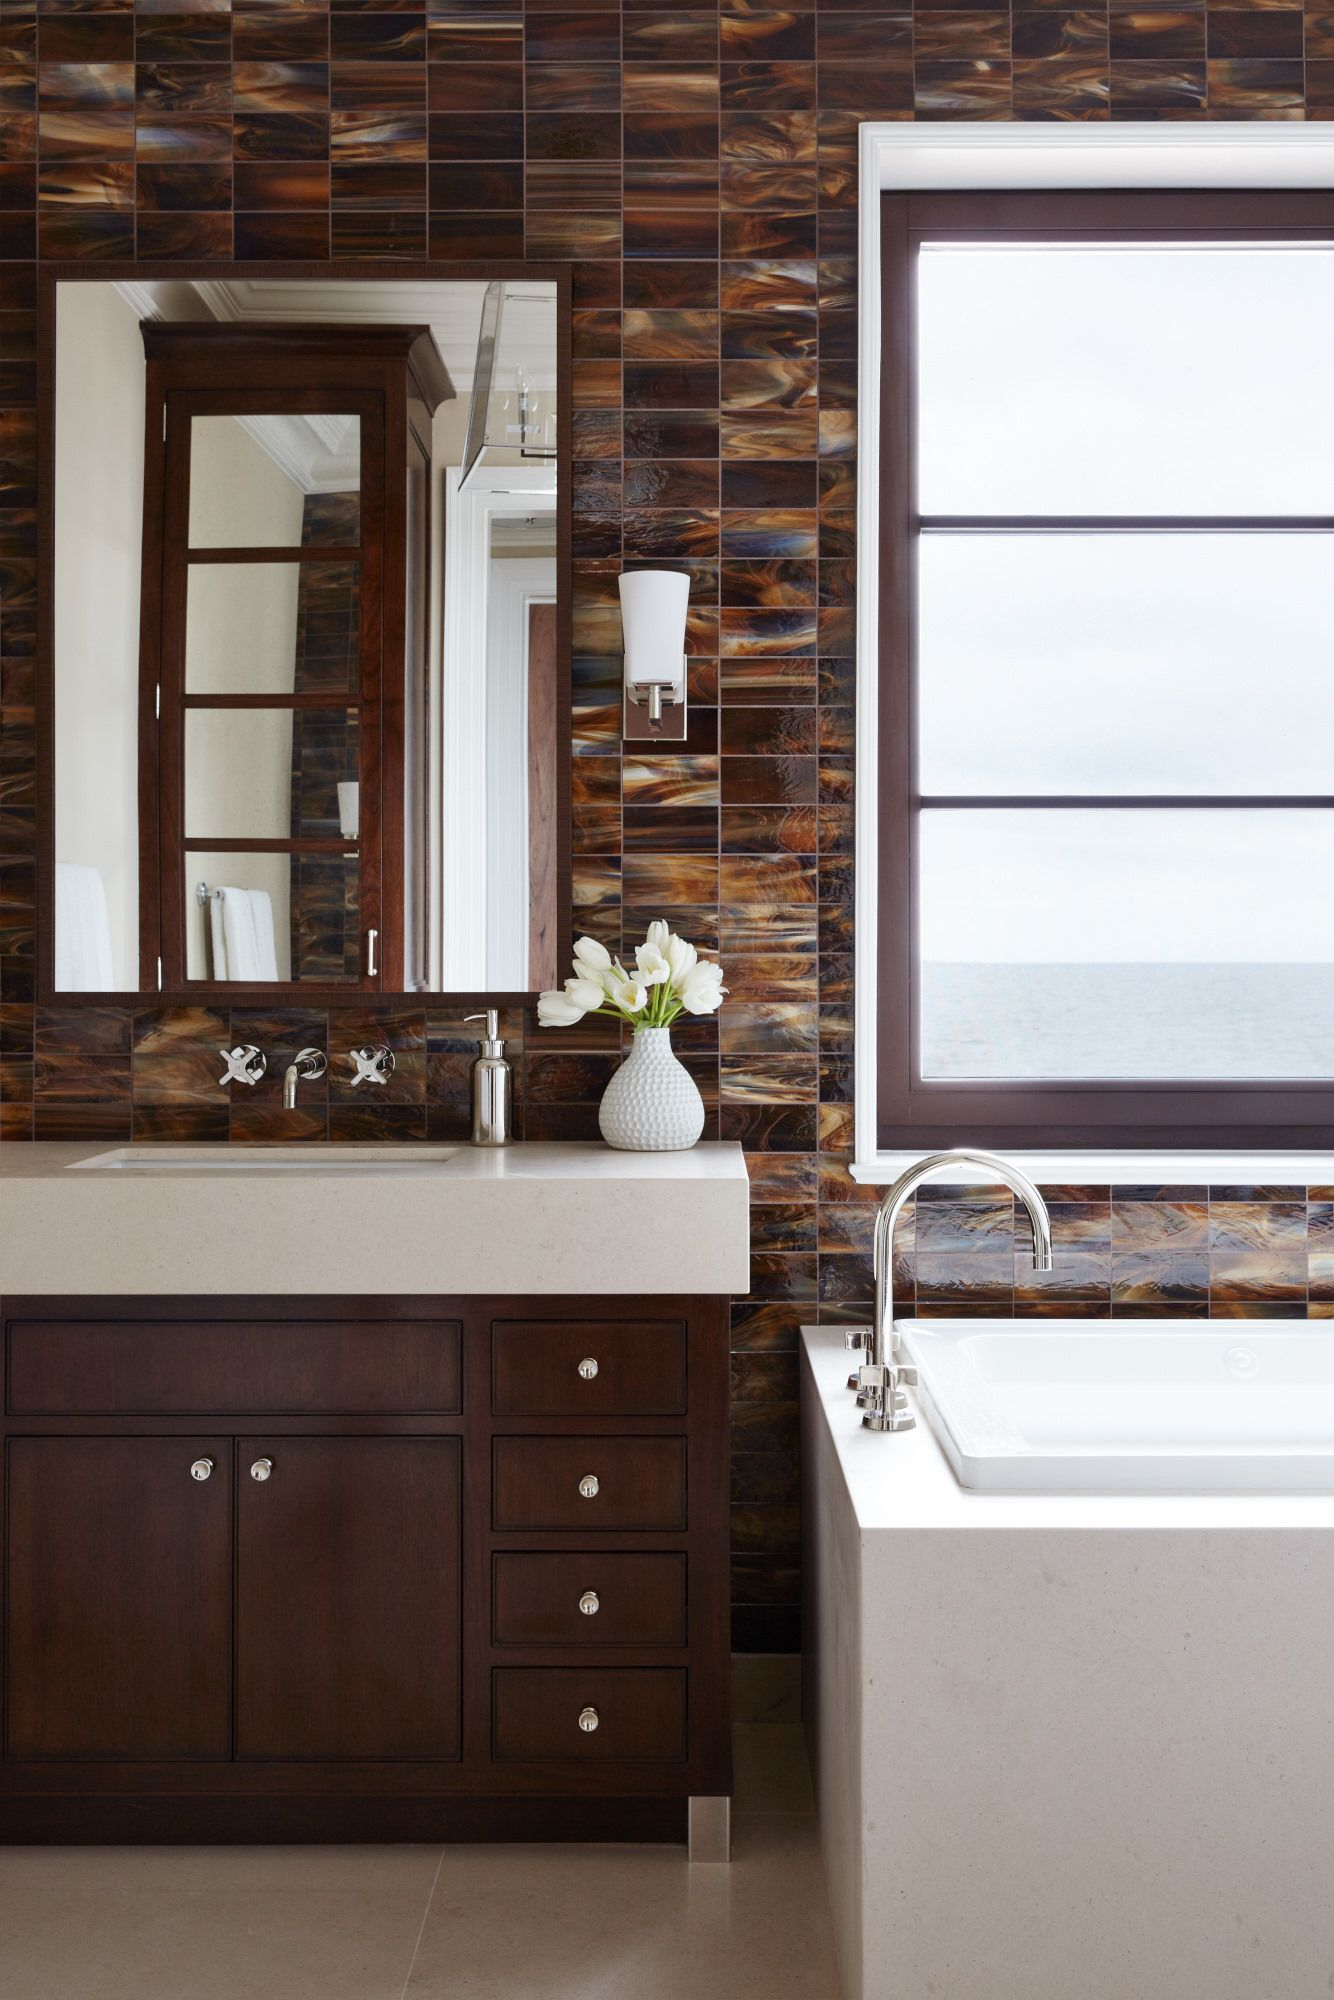 33 Bathroom Tile Design Ideas - Unique Tiled Bathrooms